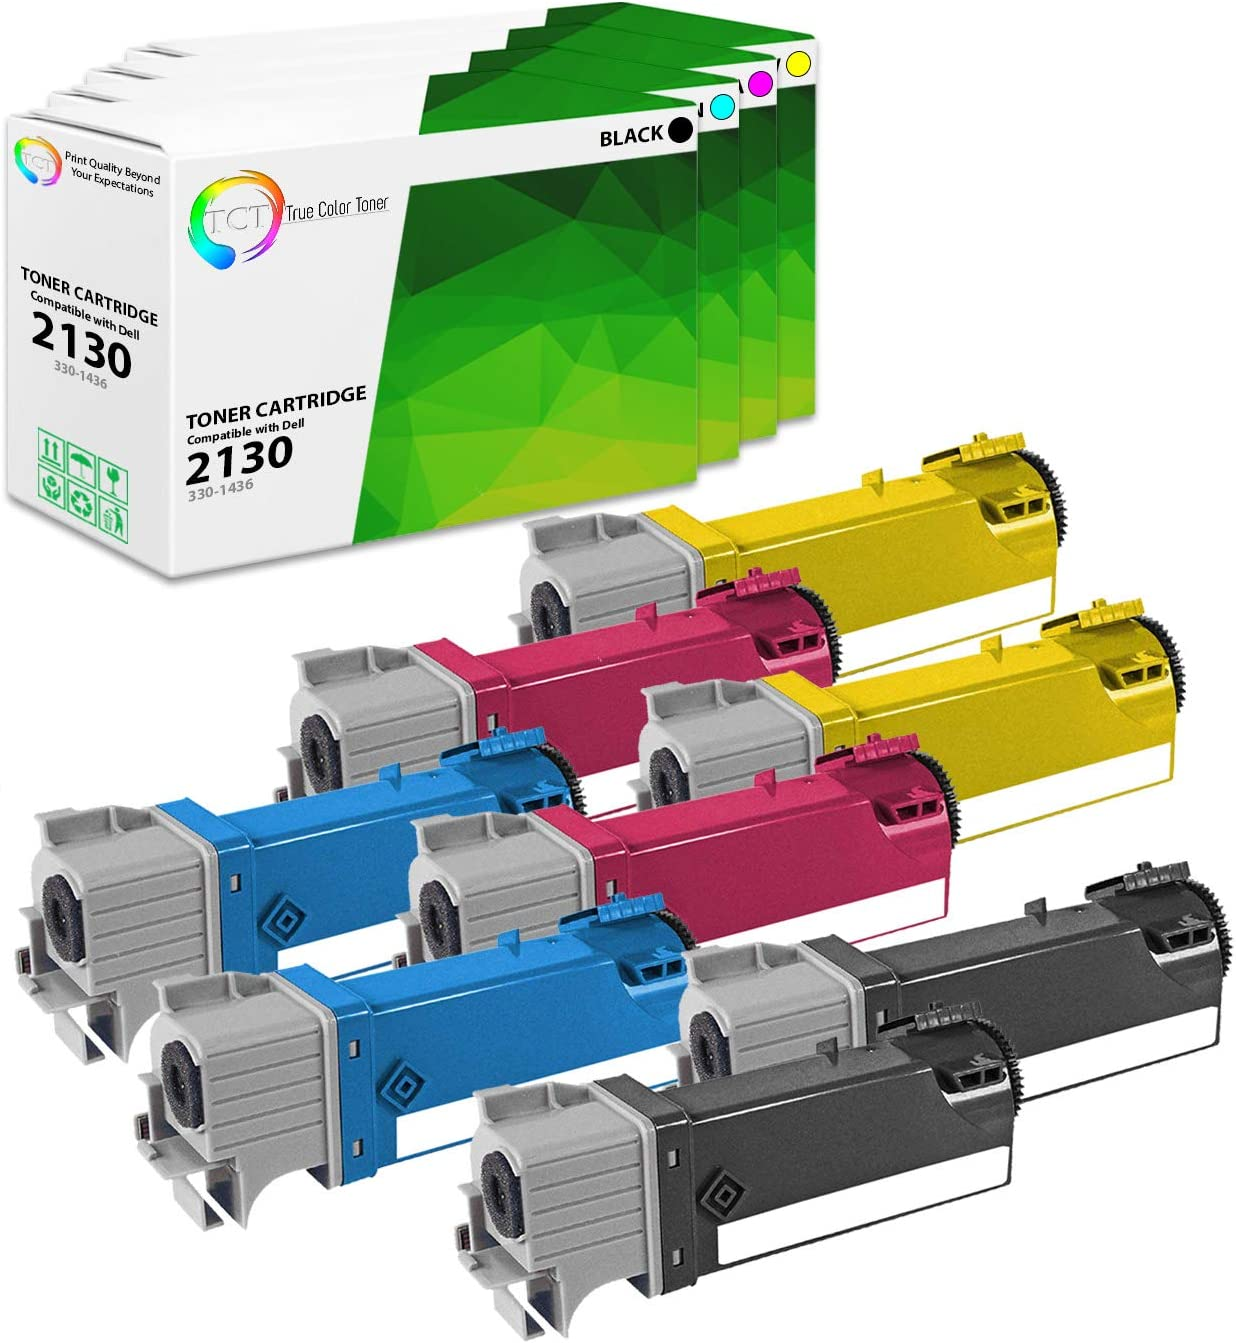 TCT Premium Compatible Toner Cartridge Replacement for Dell 2130CN 2135CN Printers (Black 330-1436, Cyan 330-1437, Magenta 330-1433, Yellow 330-1438) - 8 Pack